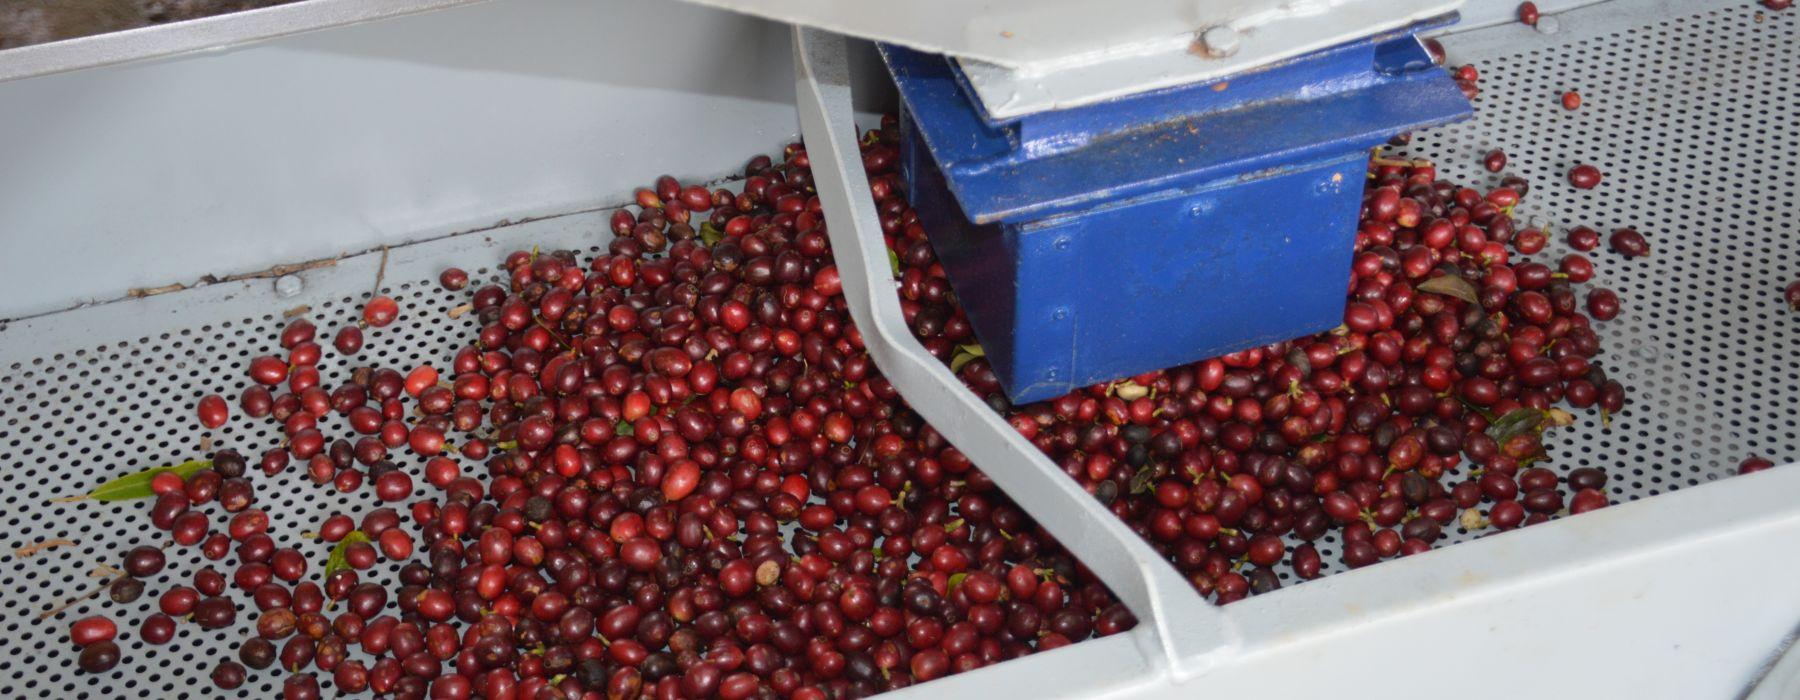 Farmers Voice Demeter Kaffee Camocim Aufbereitung